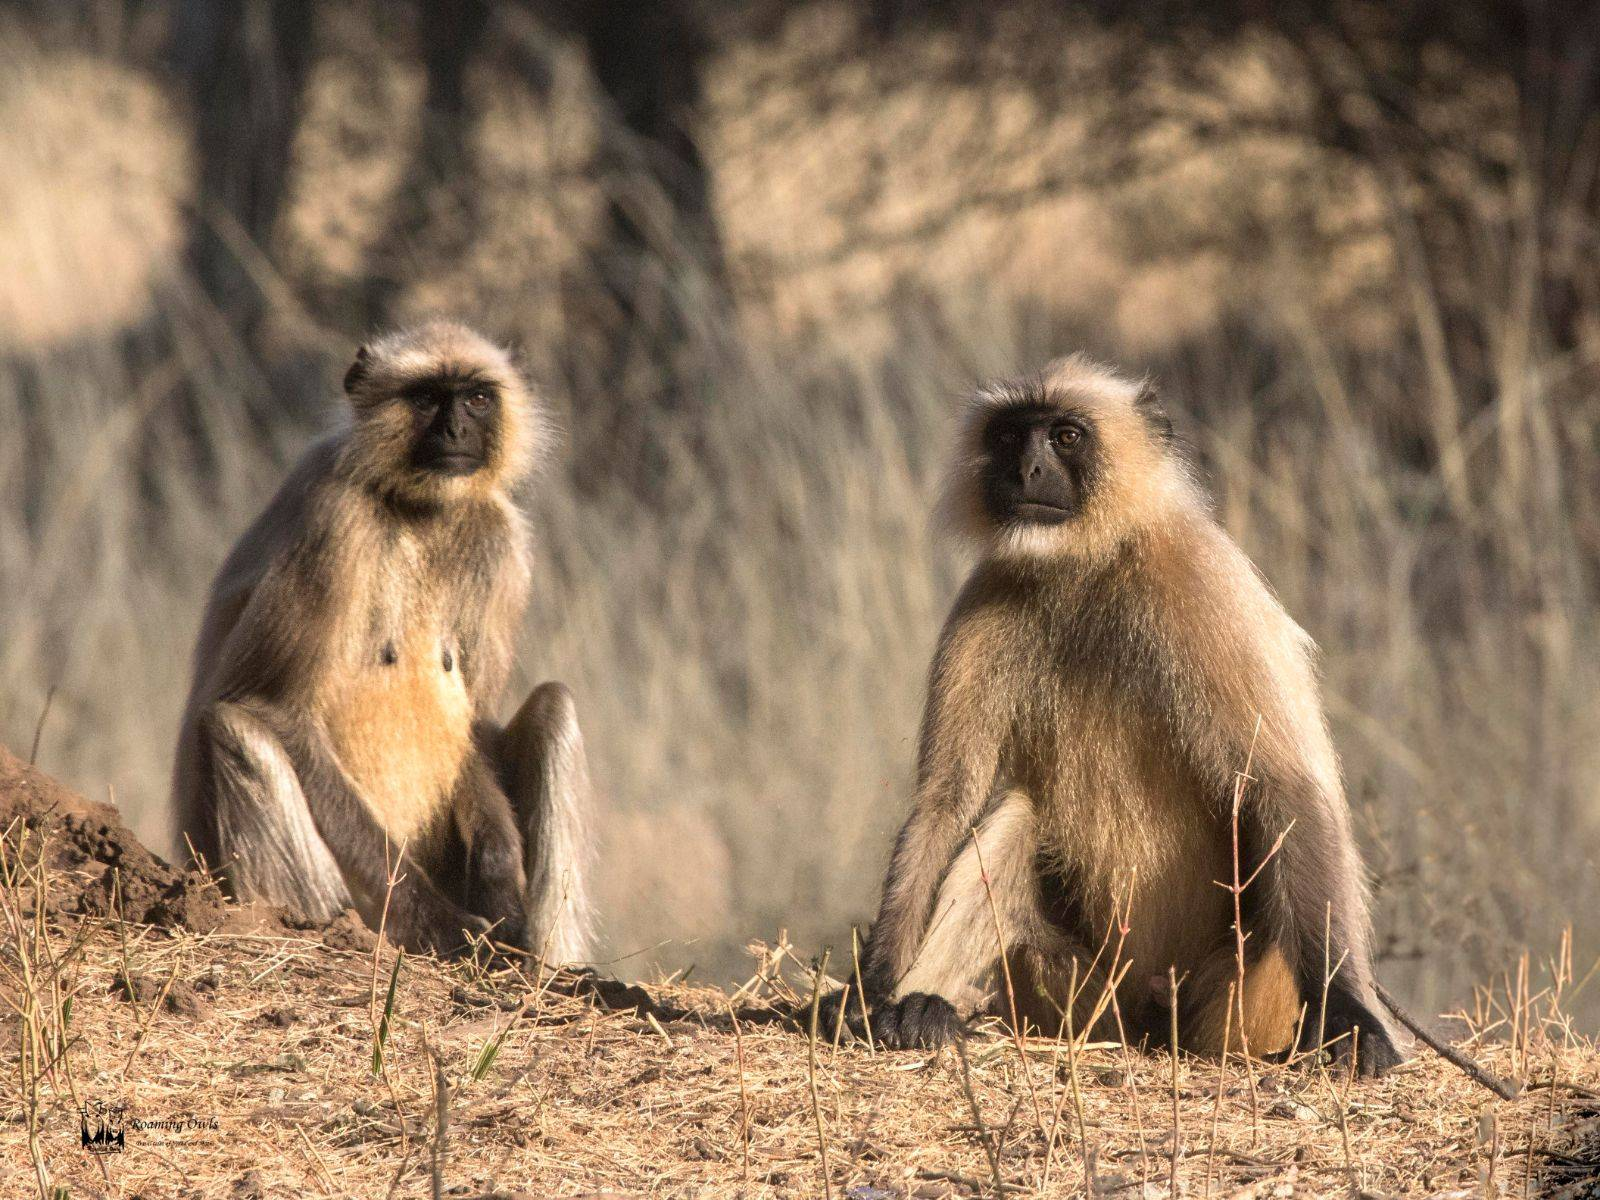 Hanuman Langur India,Ranthampore National Park zone6,Ranthampur Mammals,Indian Monkey Mammals